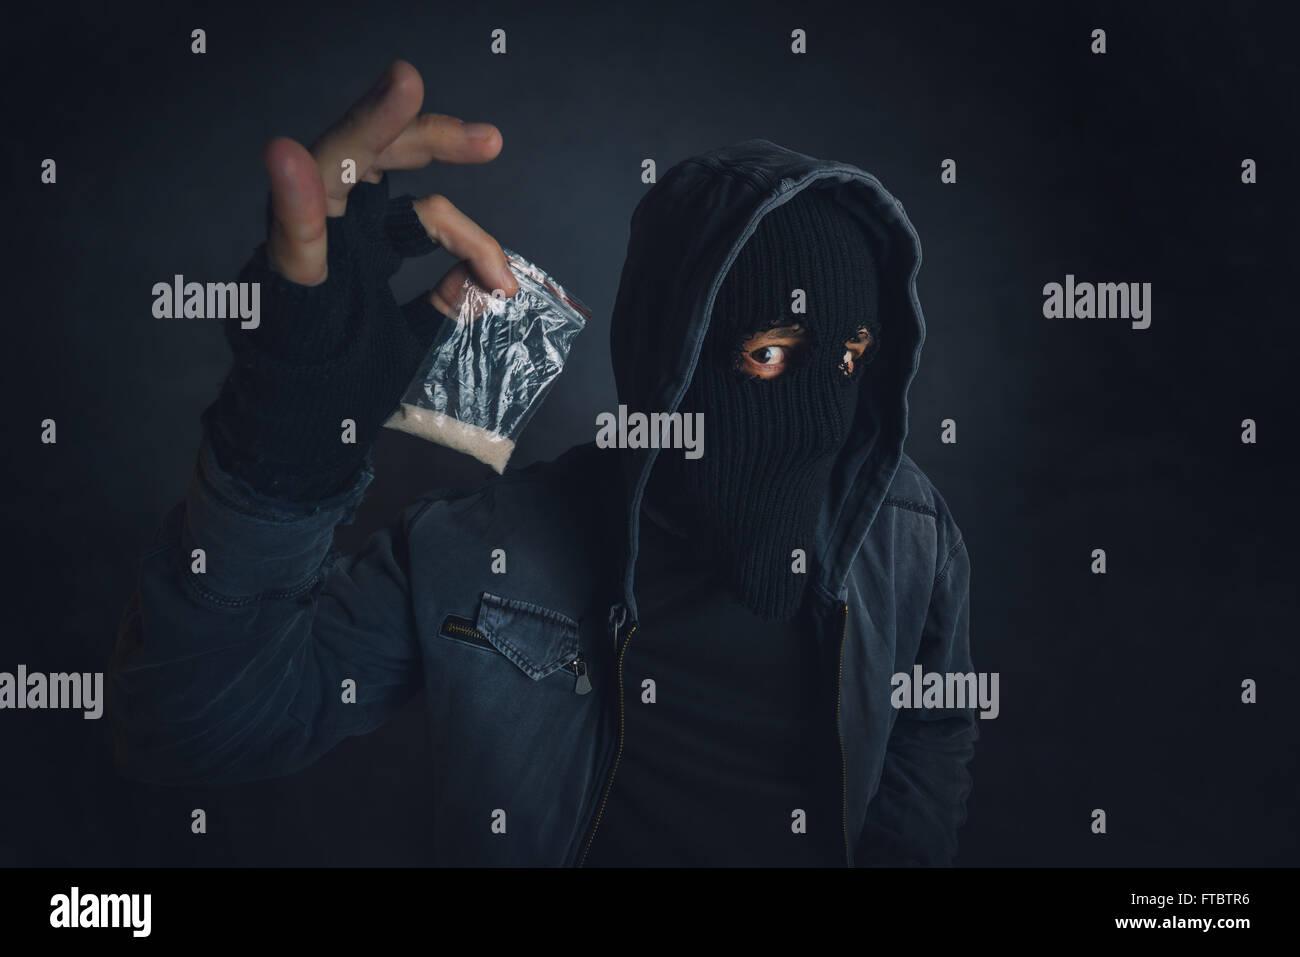 Drug dealer offering narcotic substance to addict on the street, unrecognizable hooded criminal selling drugs in - Stock Image